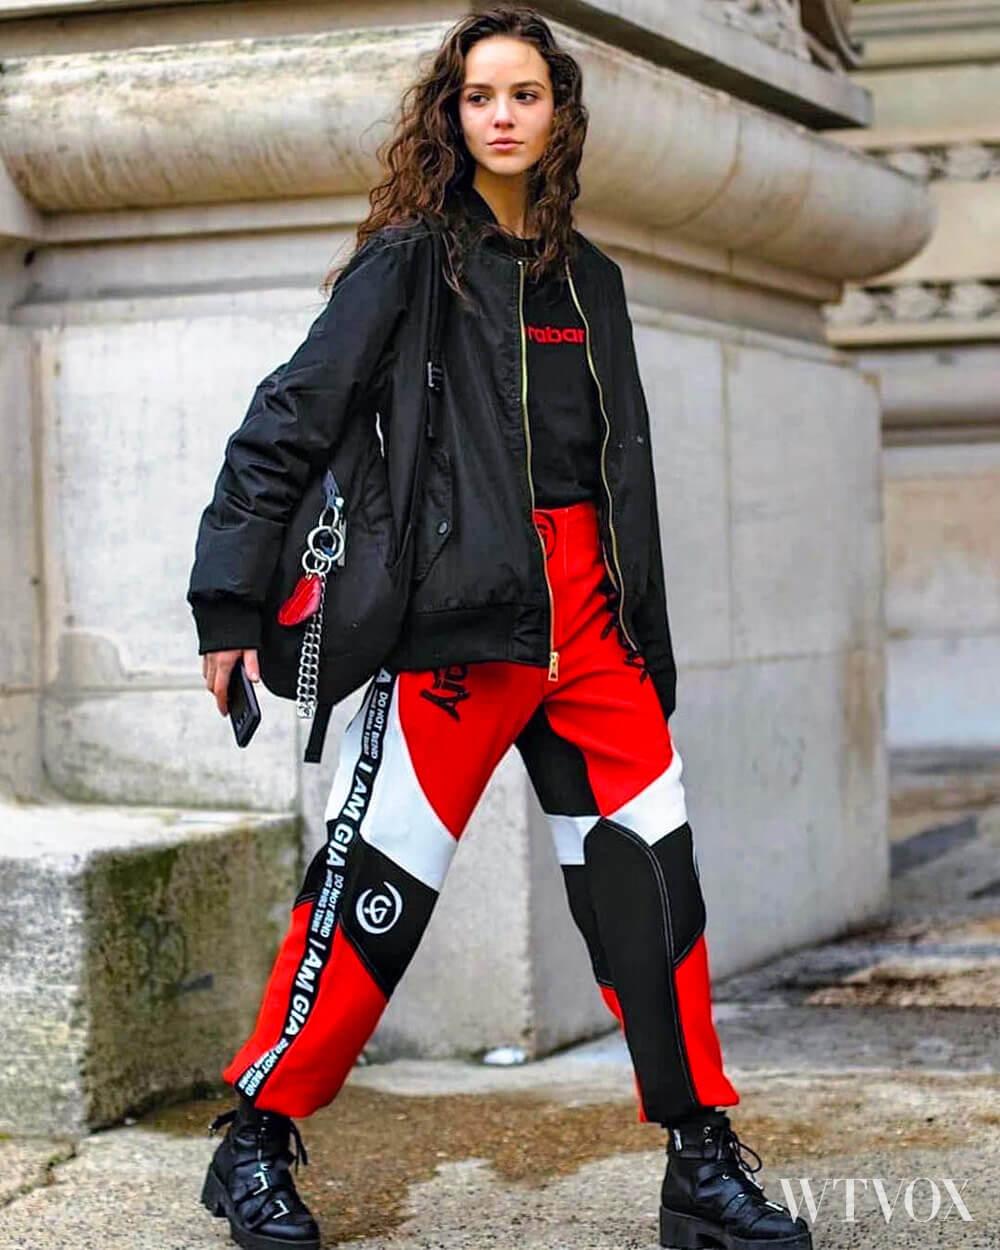 I.AM.GIA streetwear brand for women